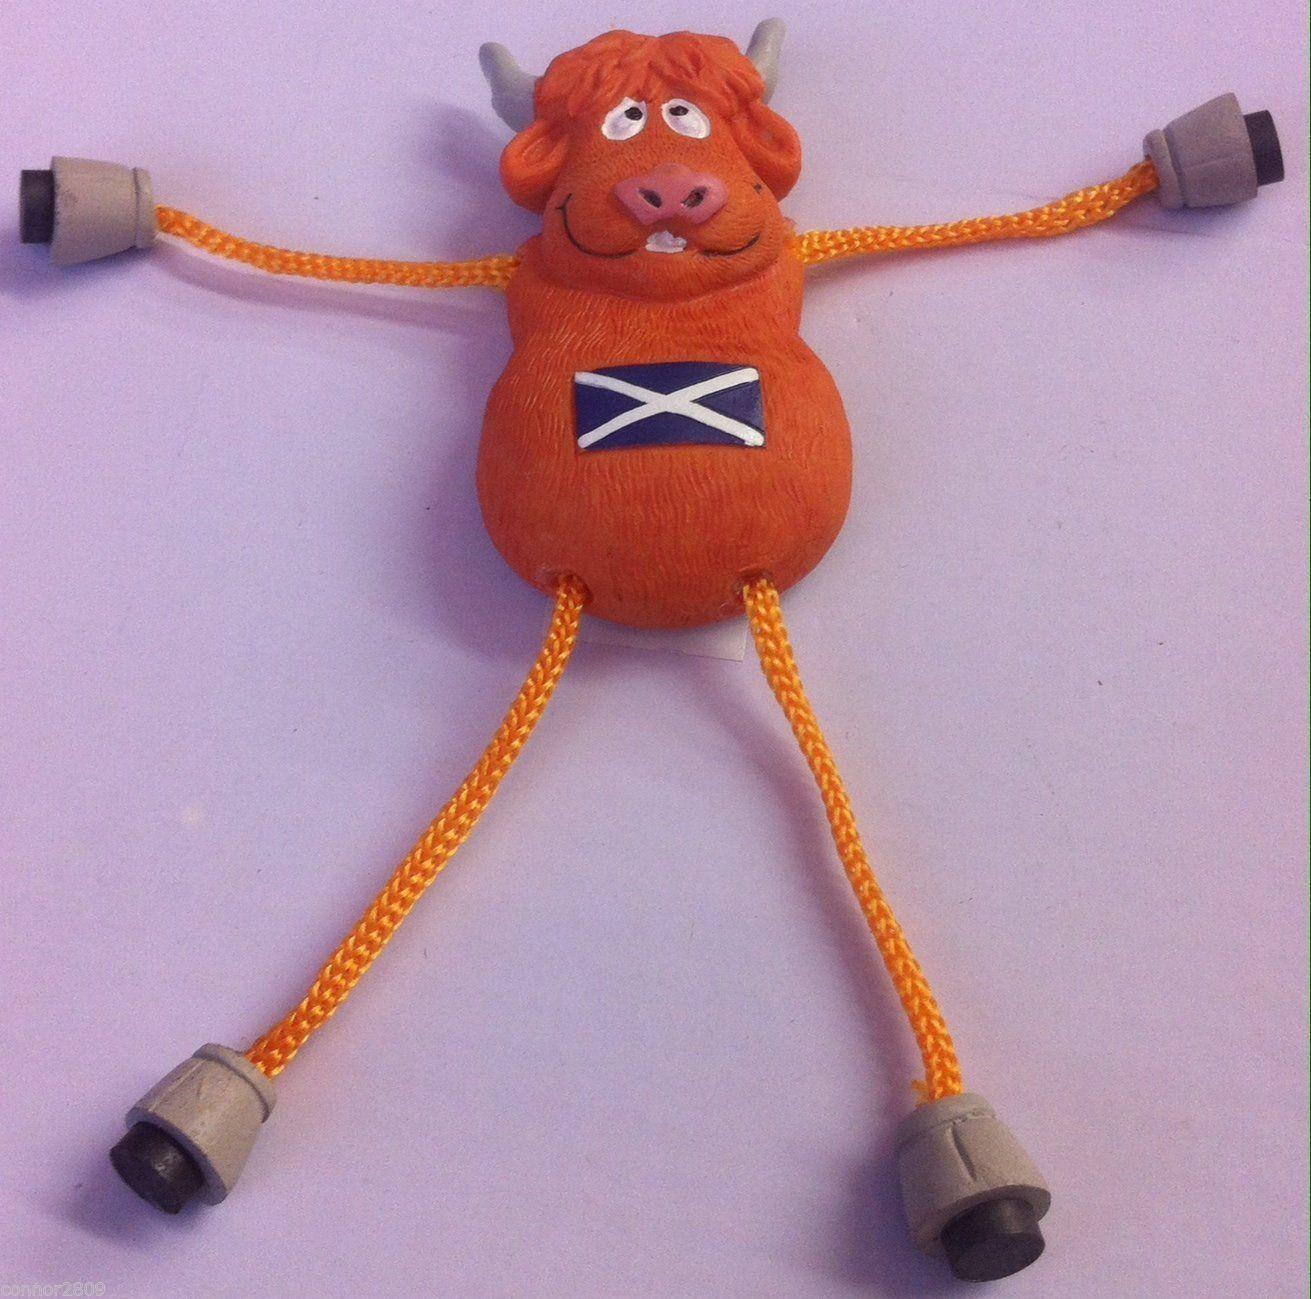 Scottish Highland Cow and Piper Dangle Leg and Arm Fridge Magnet | eBay